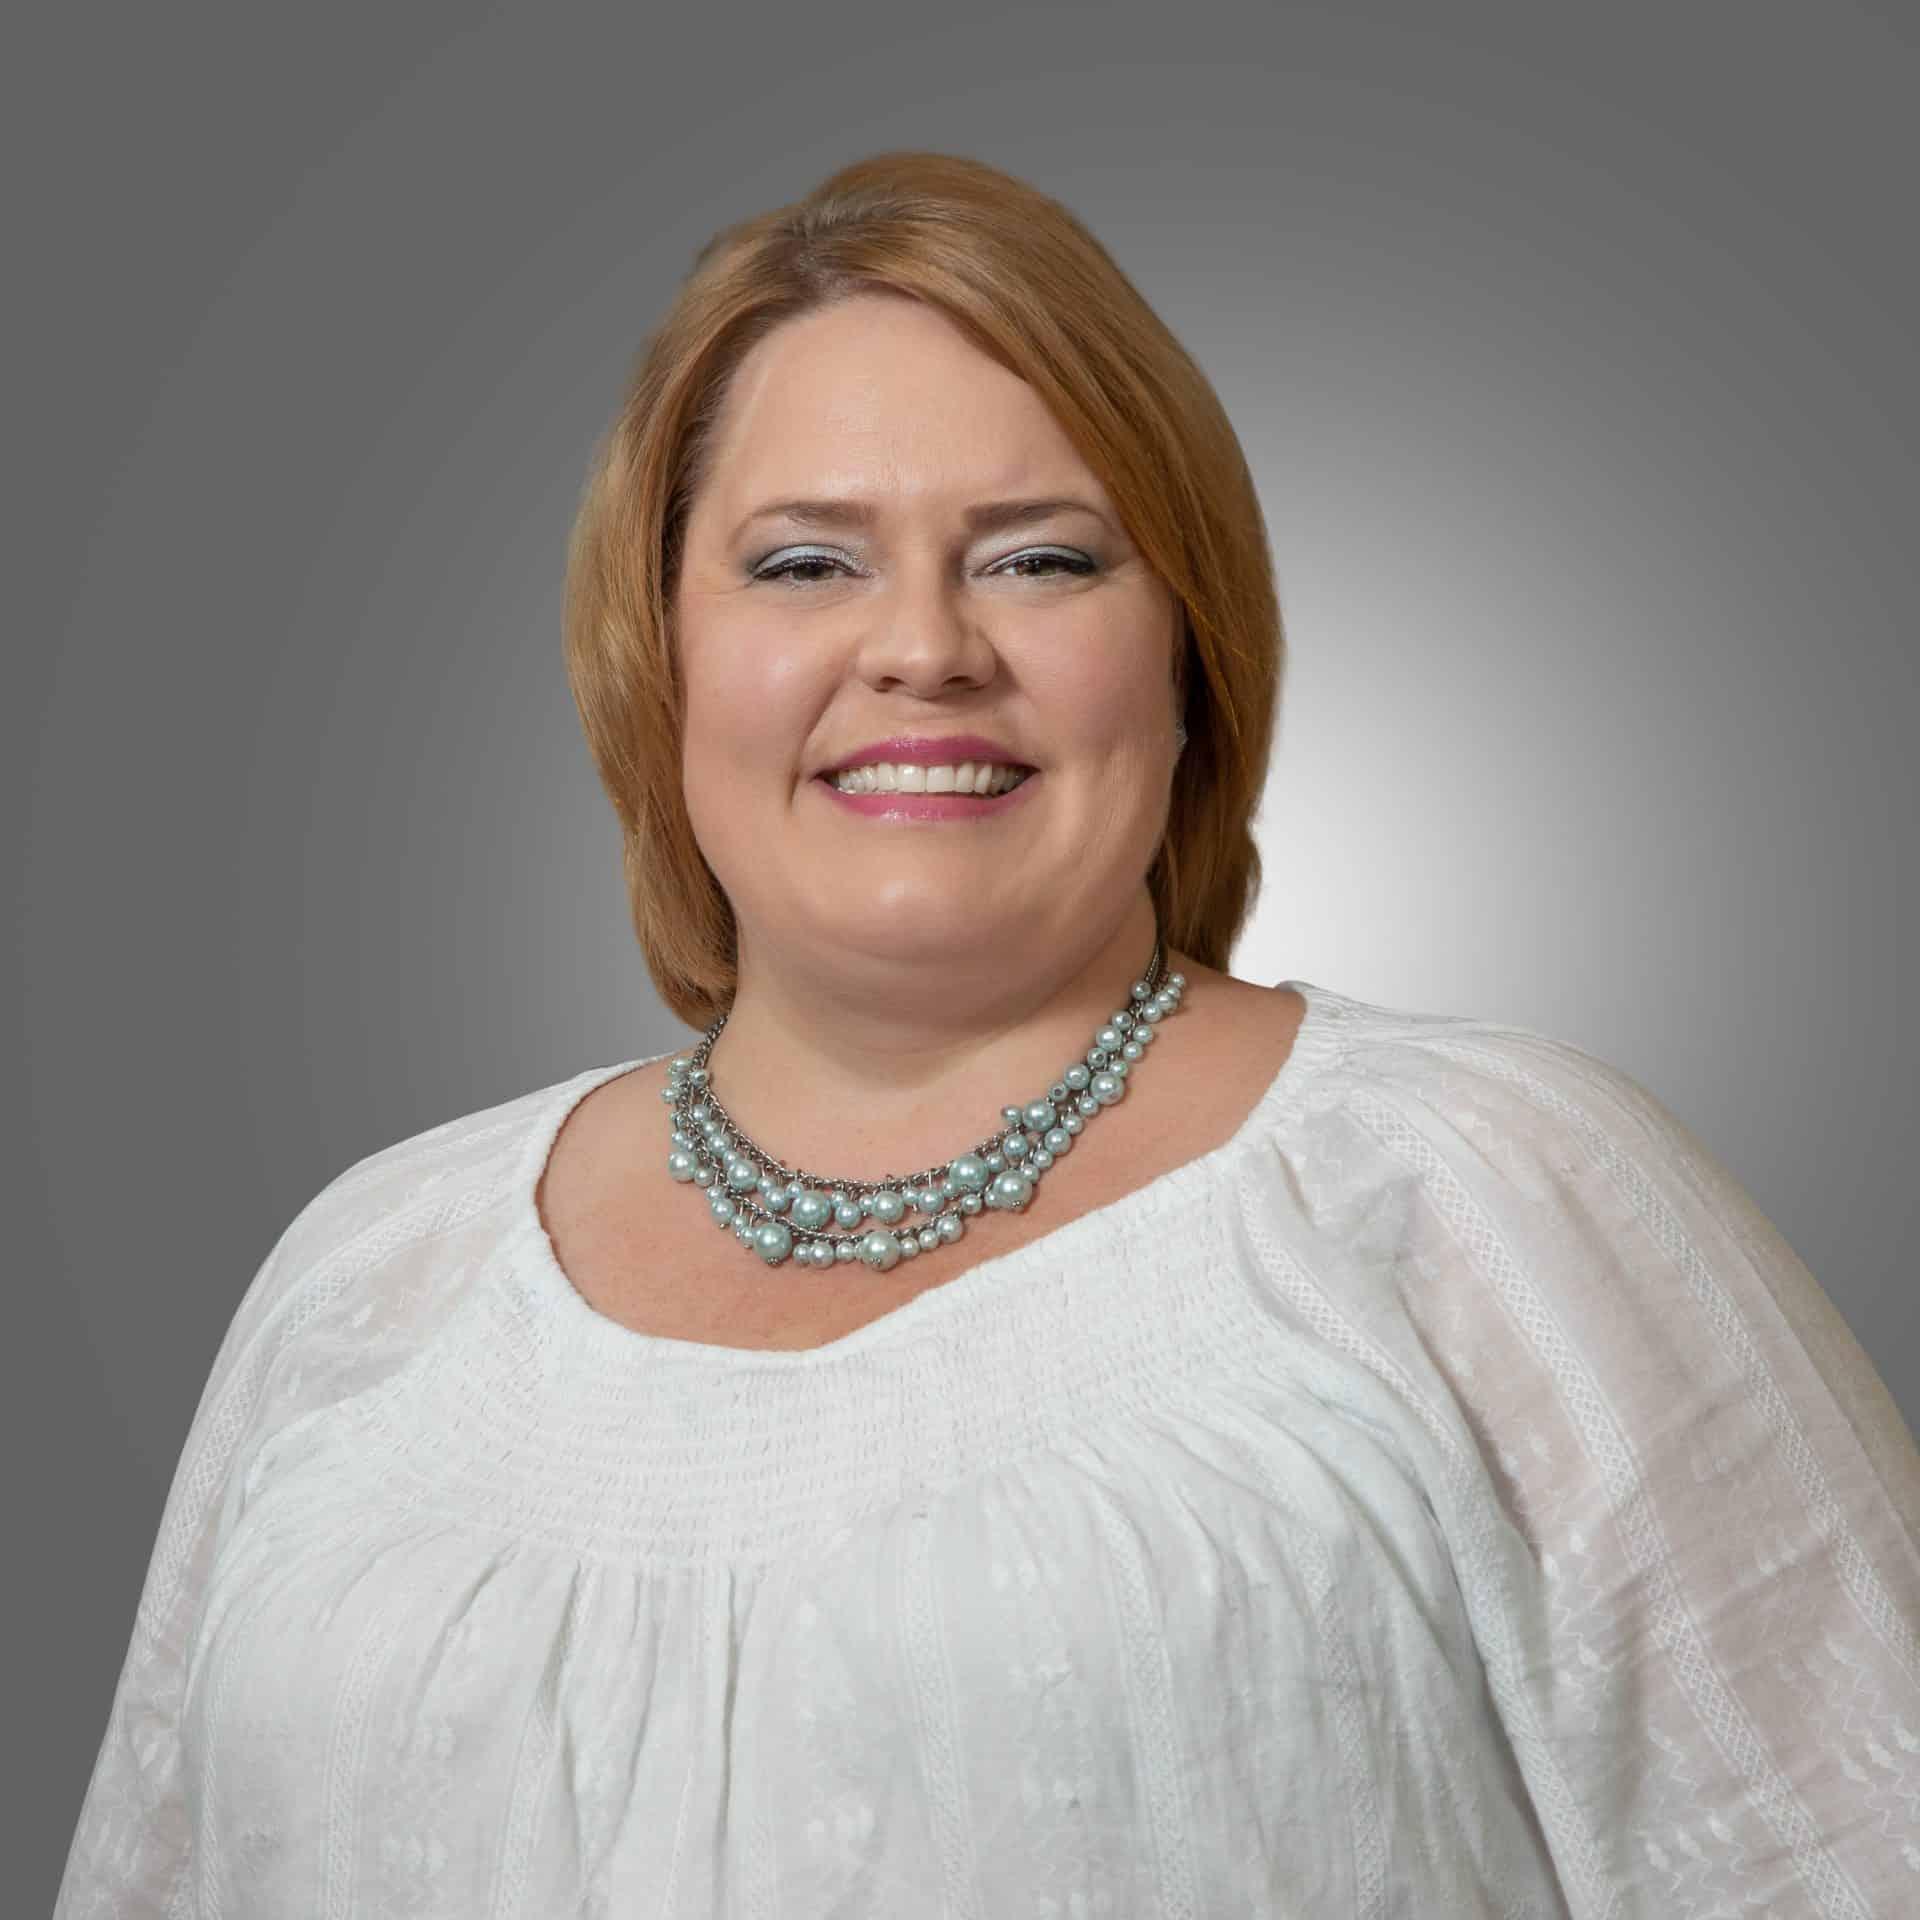 Kristin Aldana